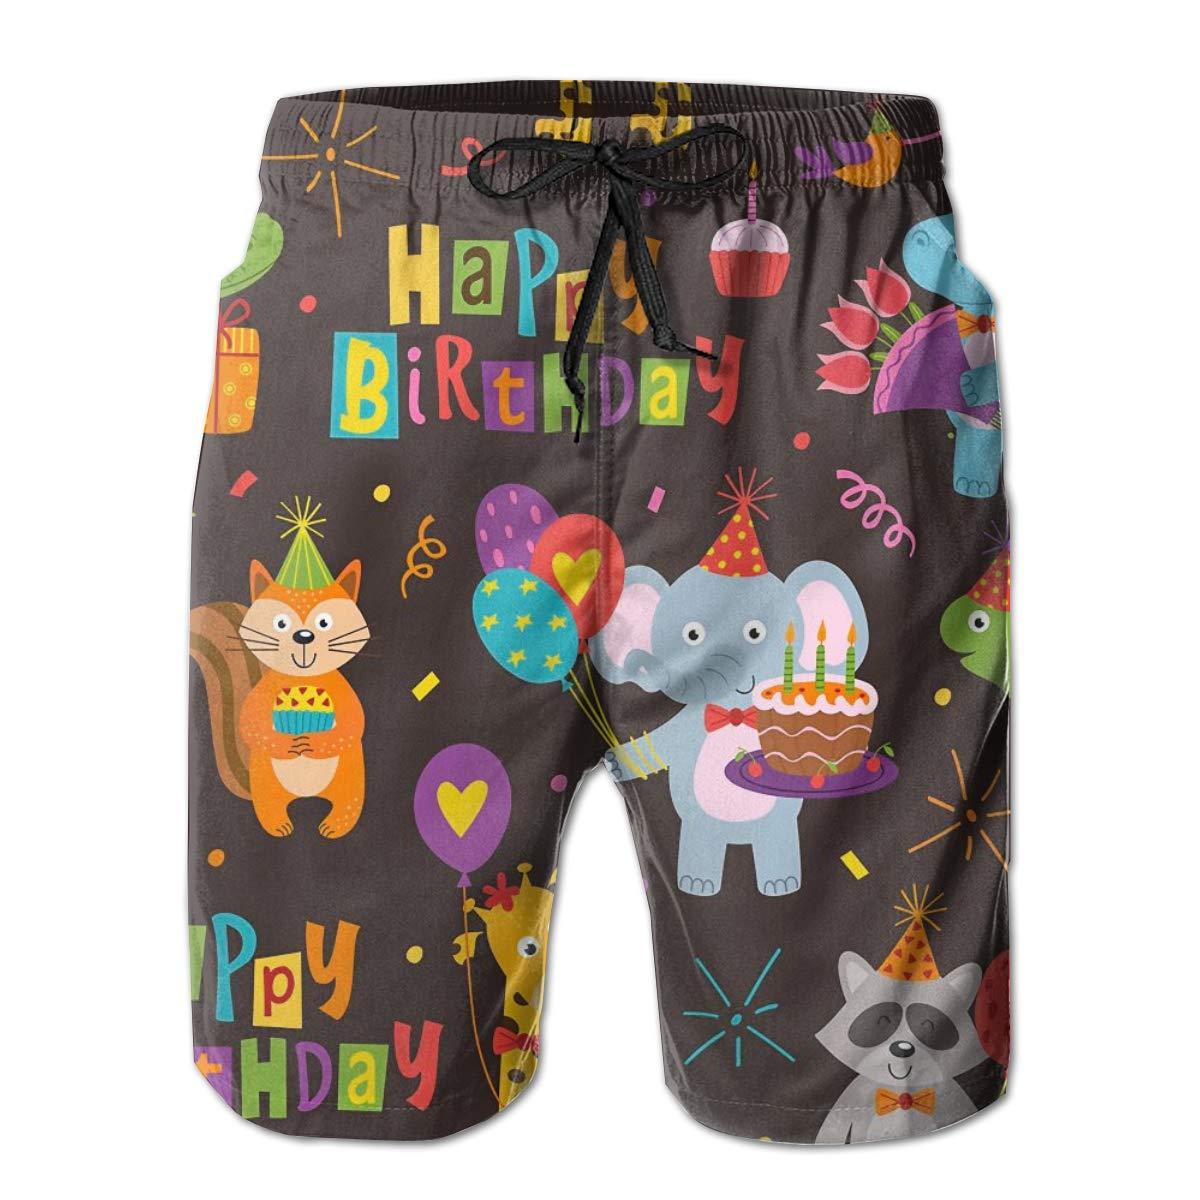 SARA NELL Mens Shorts Funny Animals Happy Birthday Quick Dry Swim Trunks Beach Board Shorts